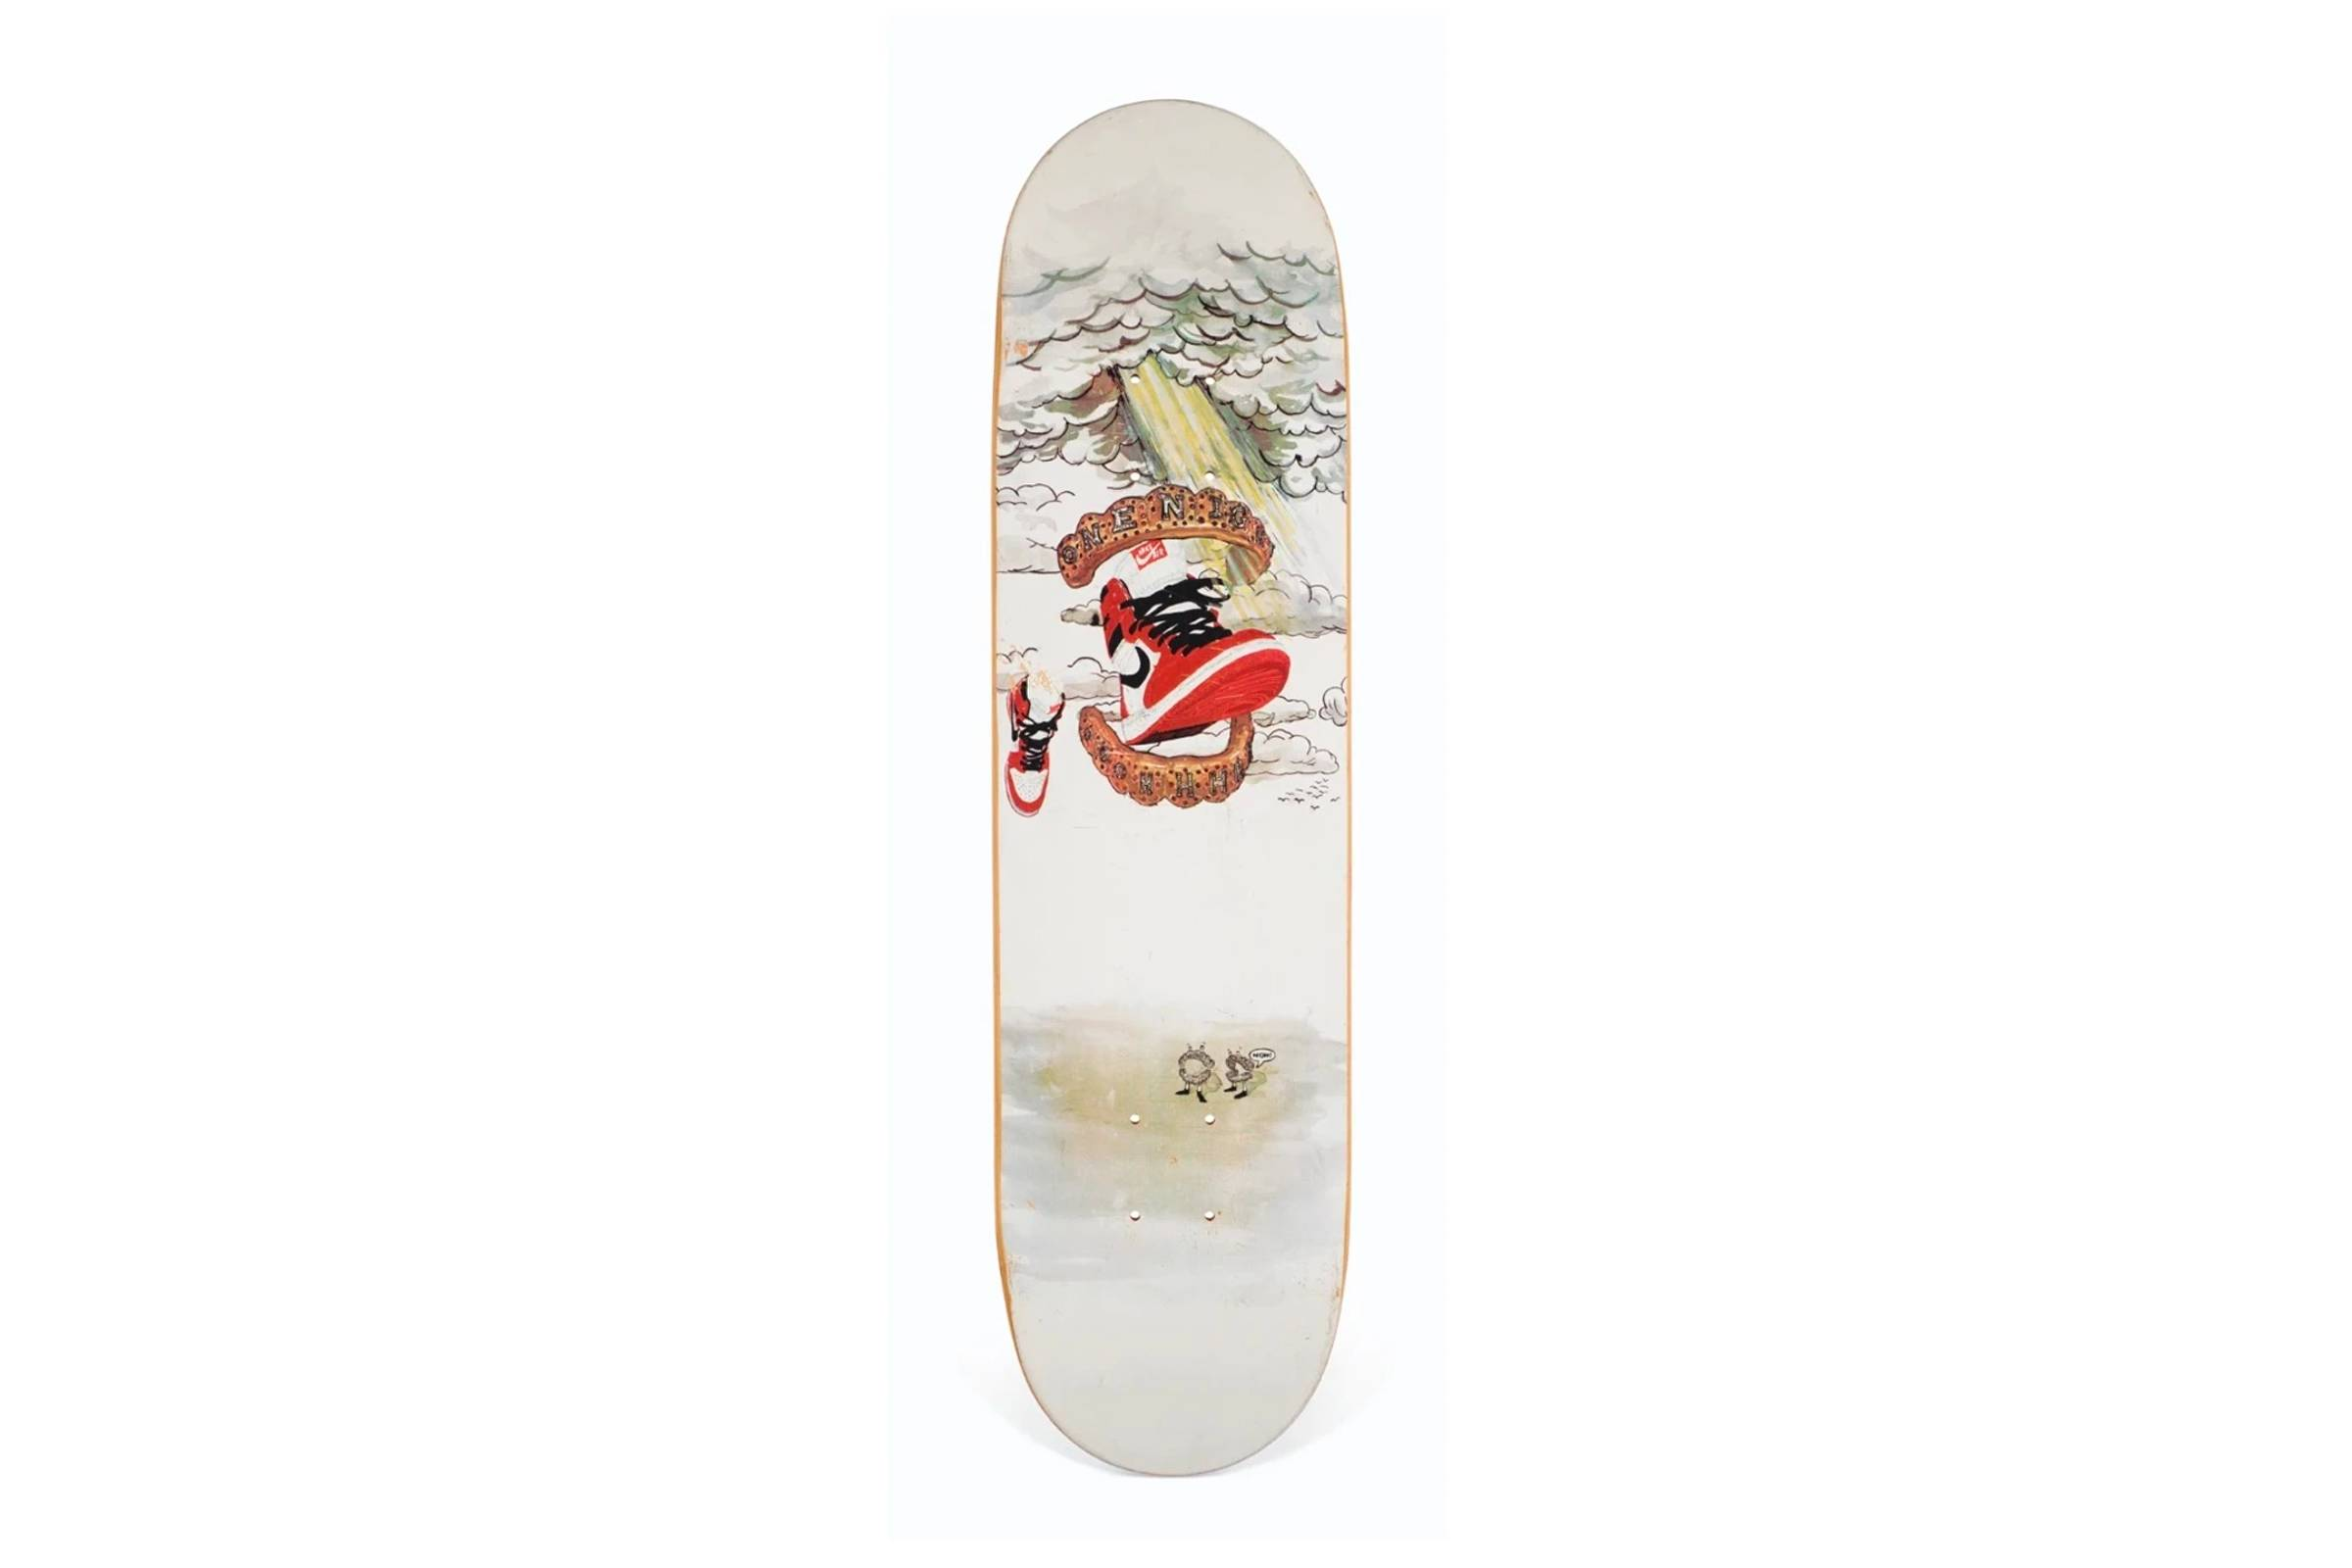 Supreme Skateboard by Dan Colen